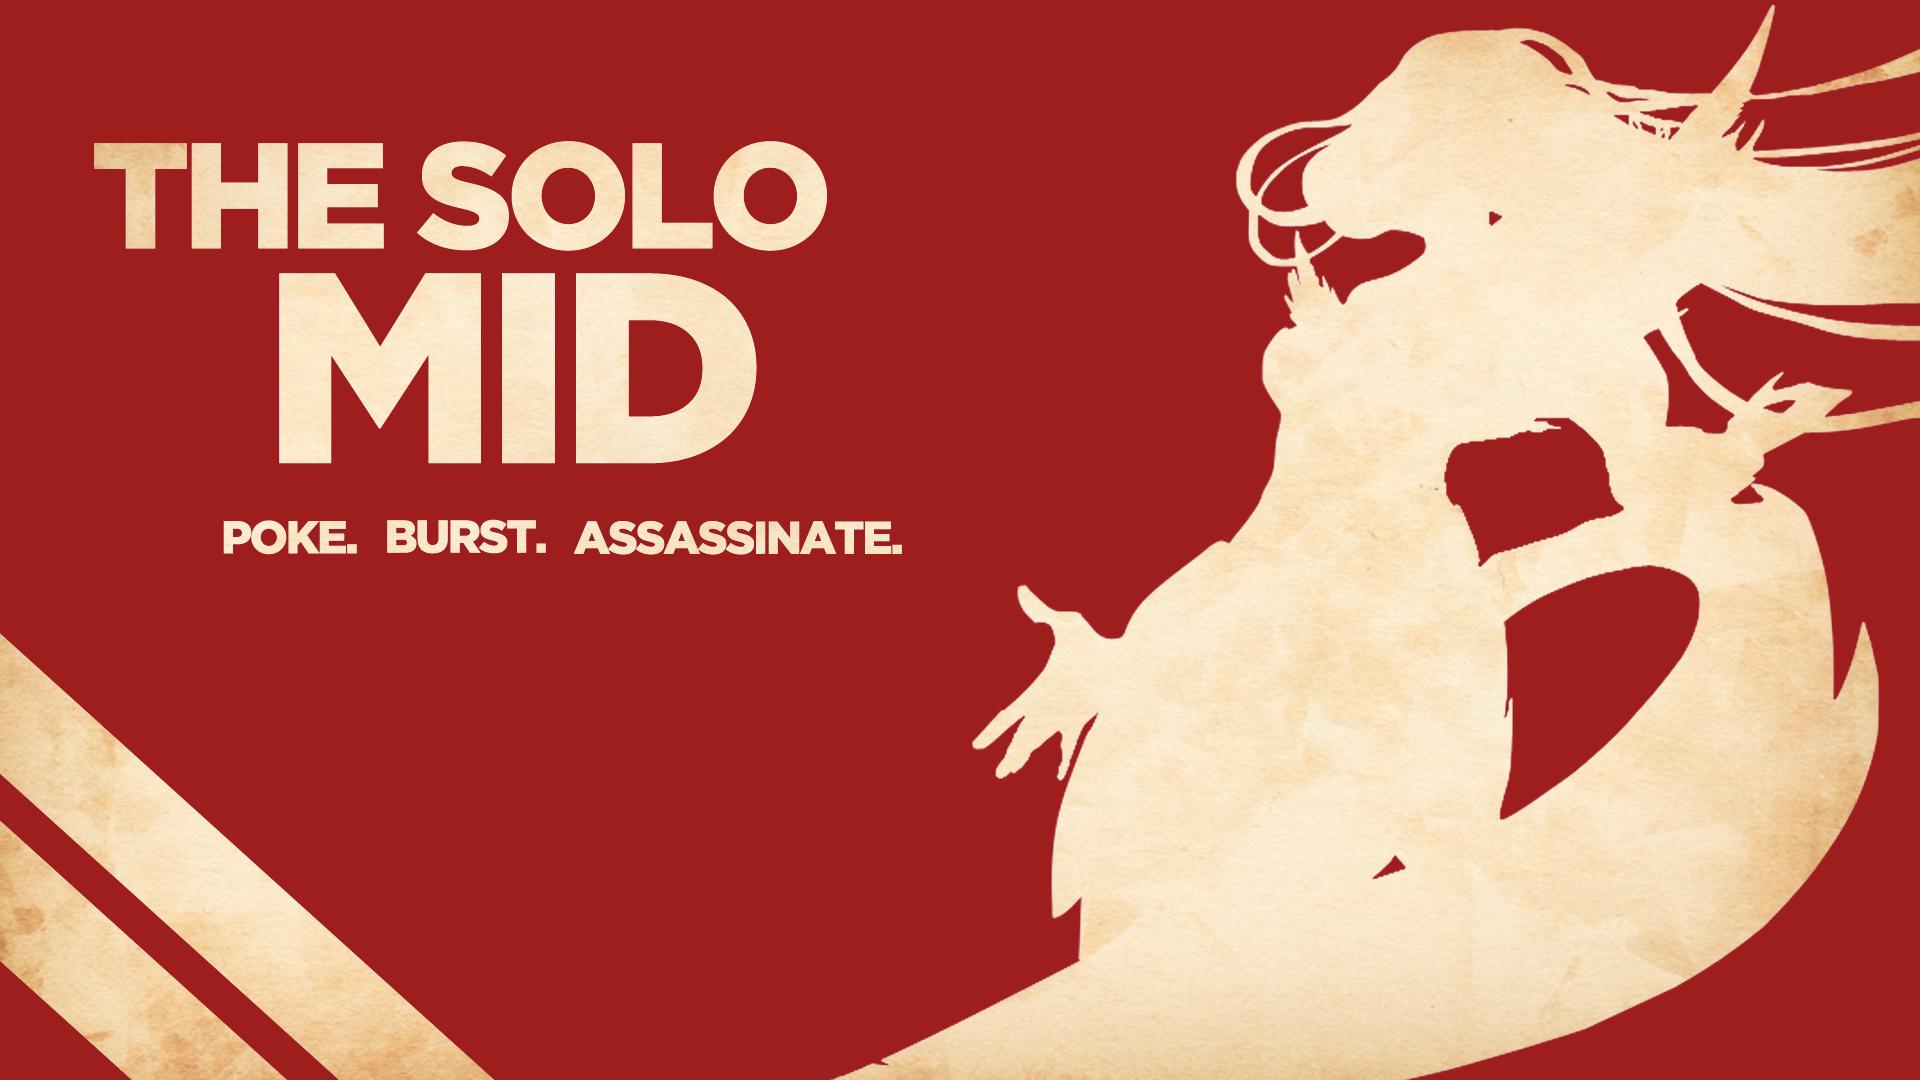 The Solo Mid wallpaper